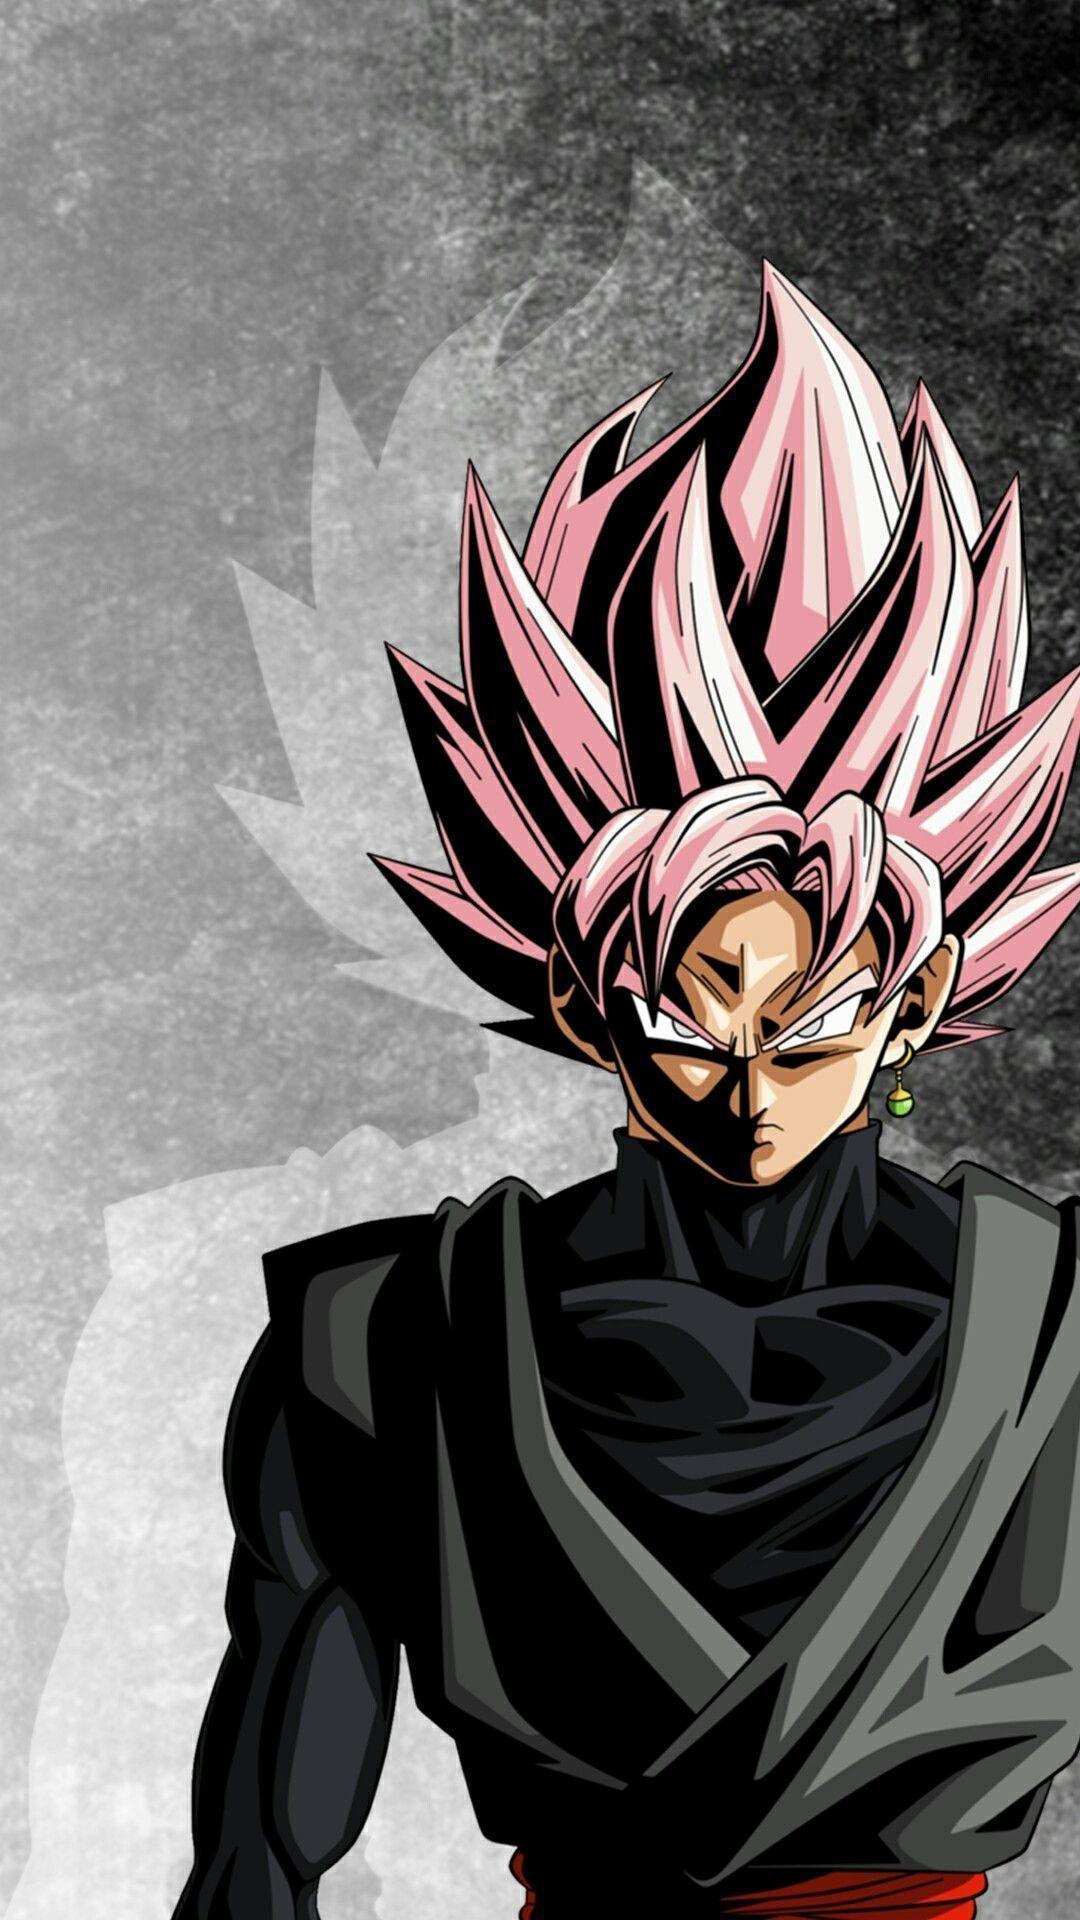 Black Goku Android, iPhone, Desktop HD Backgrounds